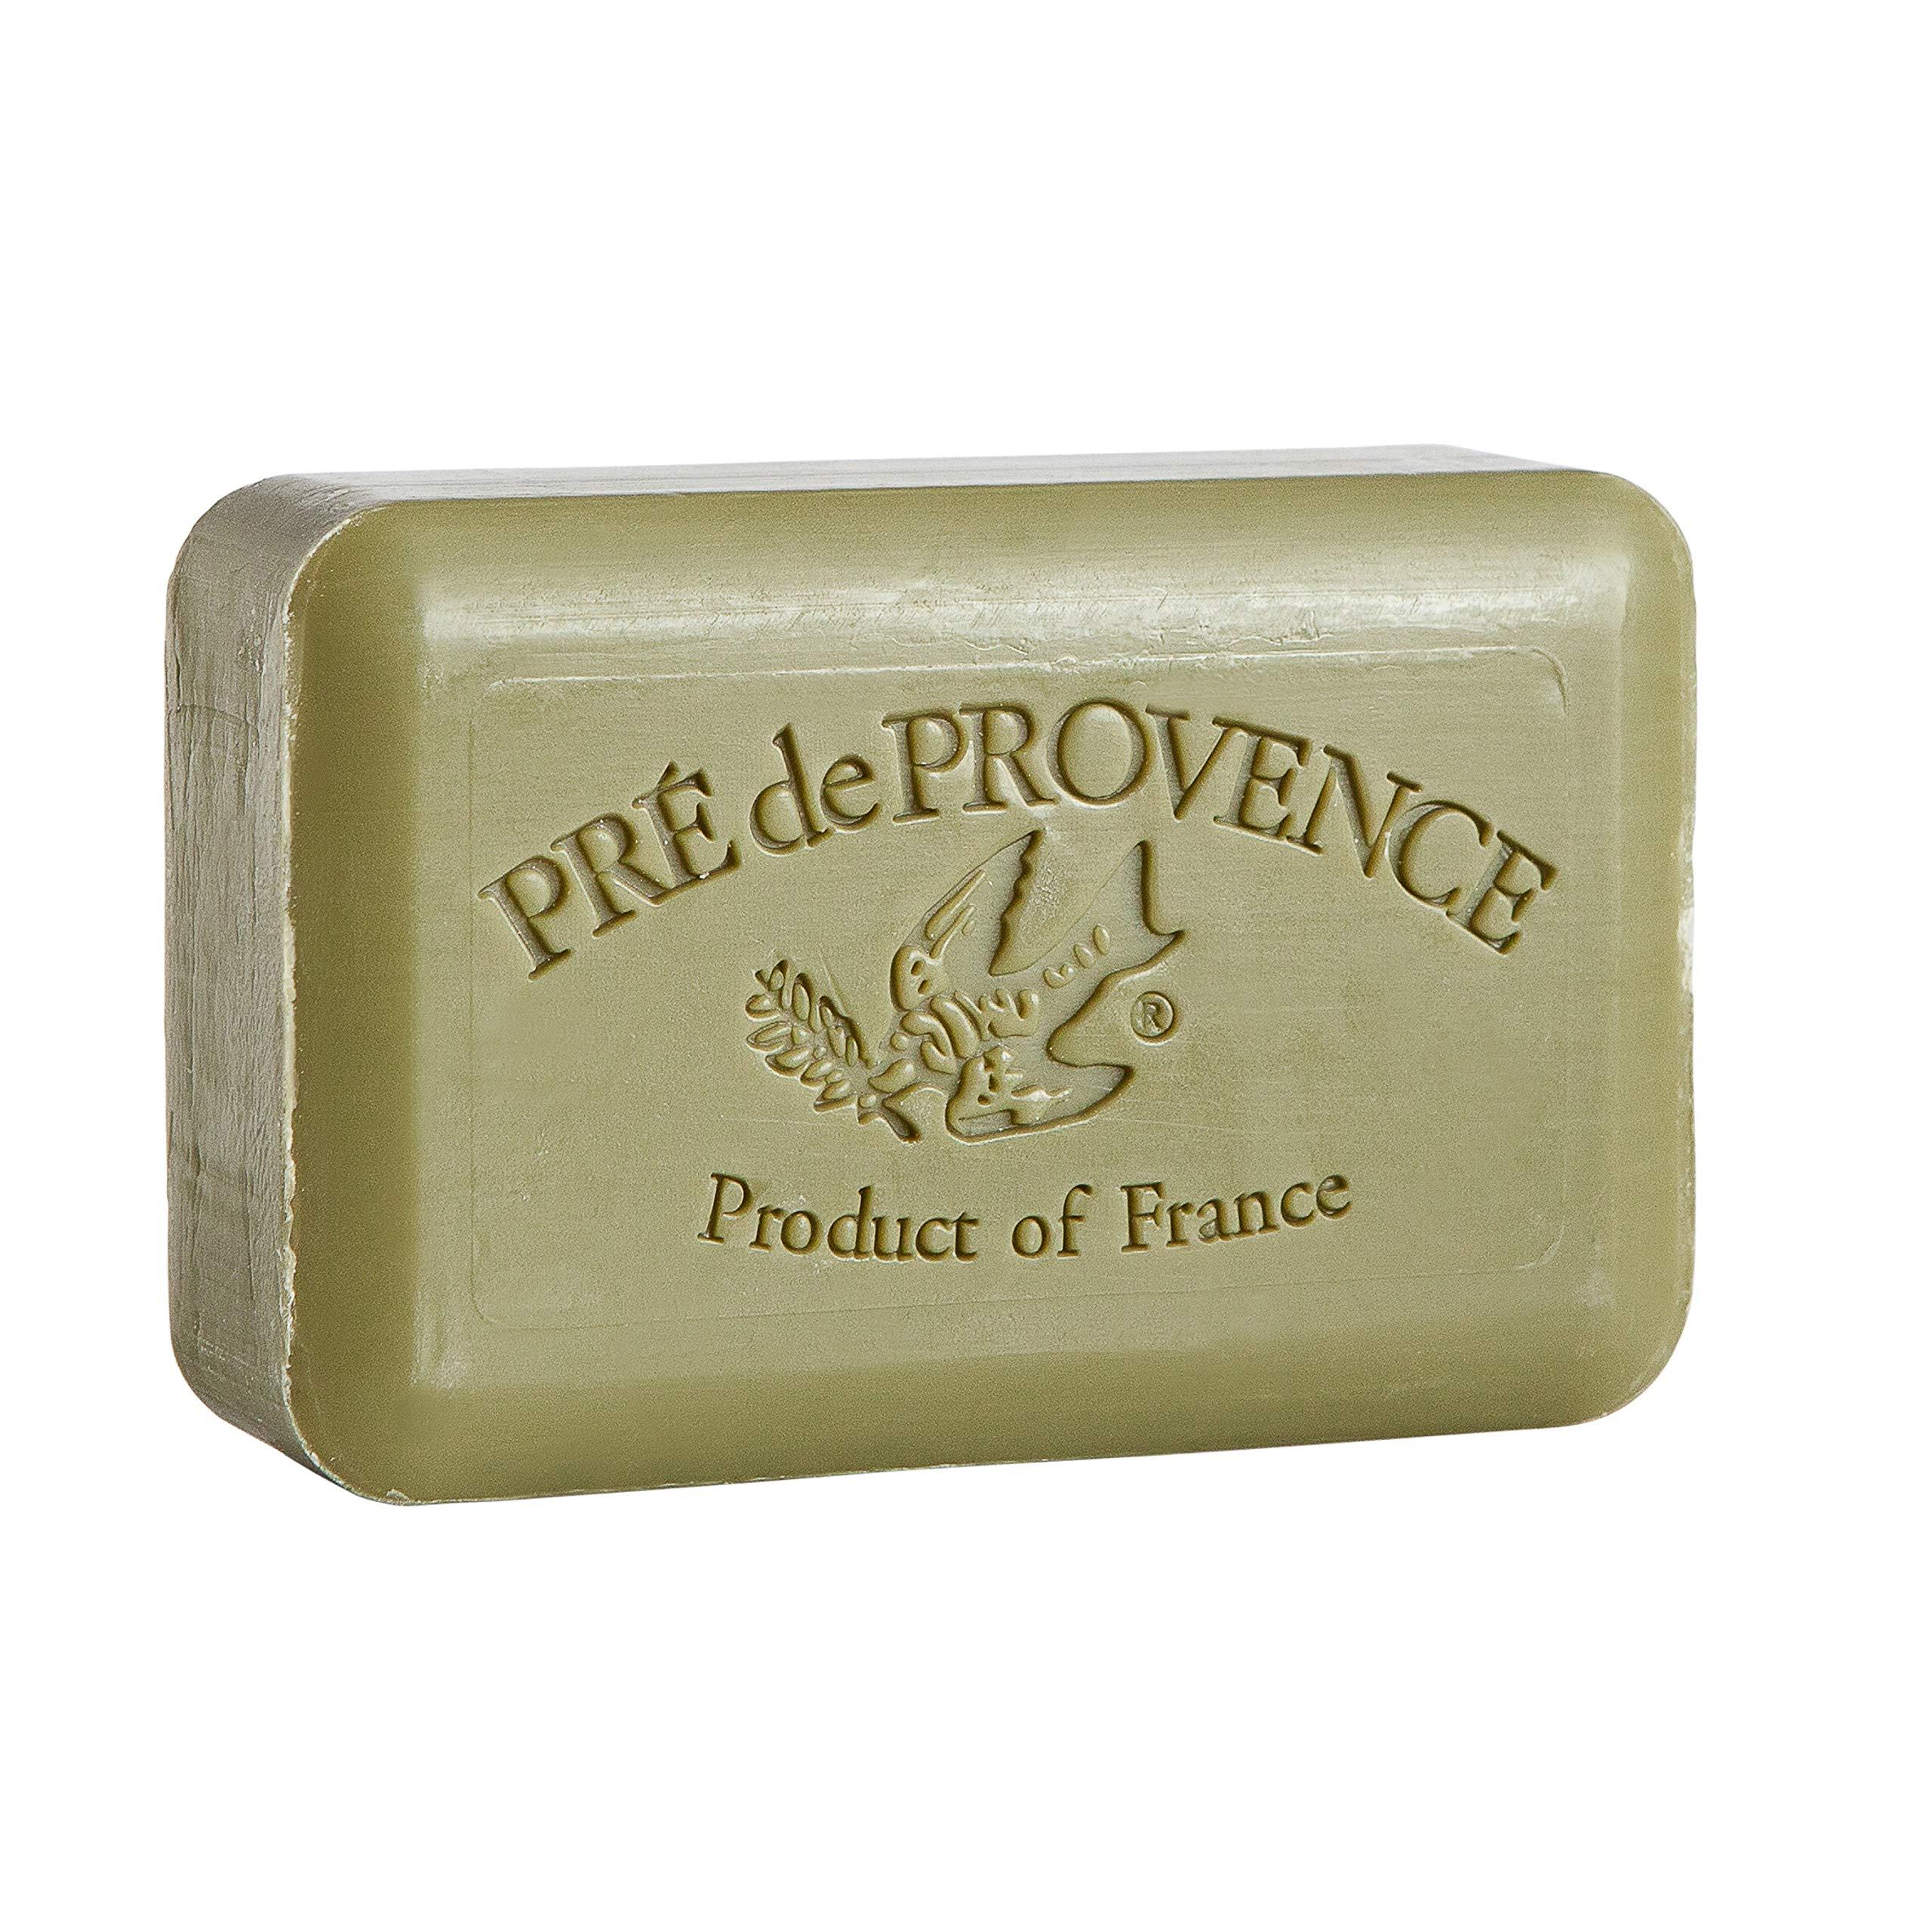 Pre Provence Artisanal Enriched Quad Milled